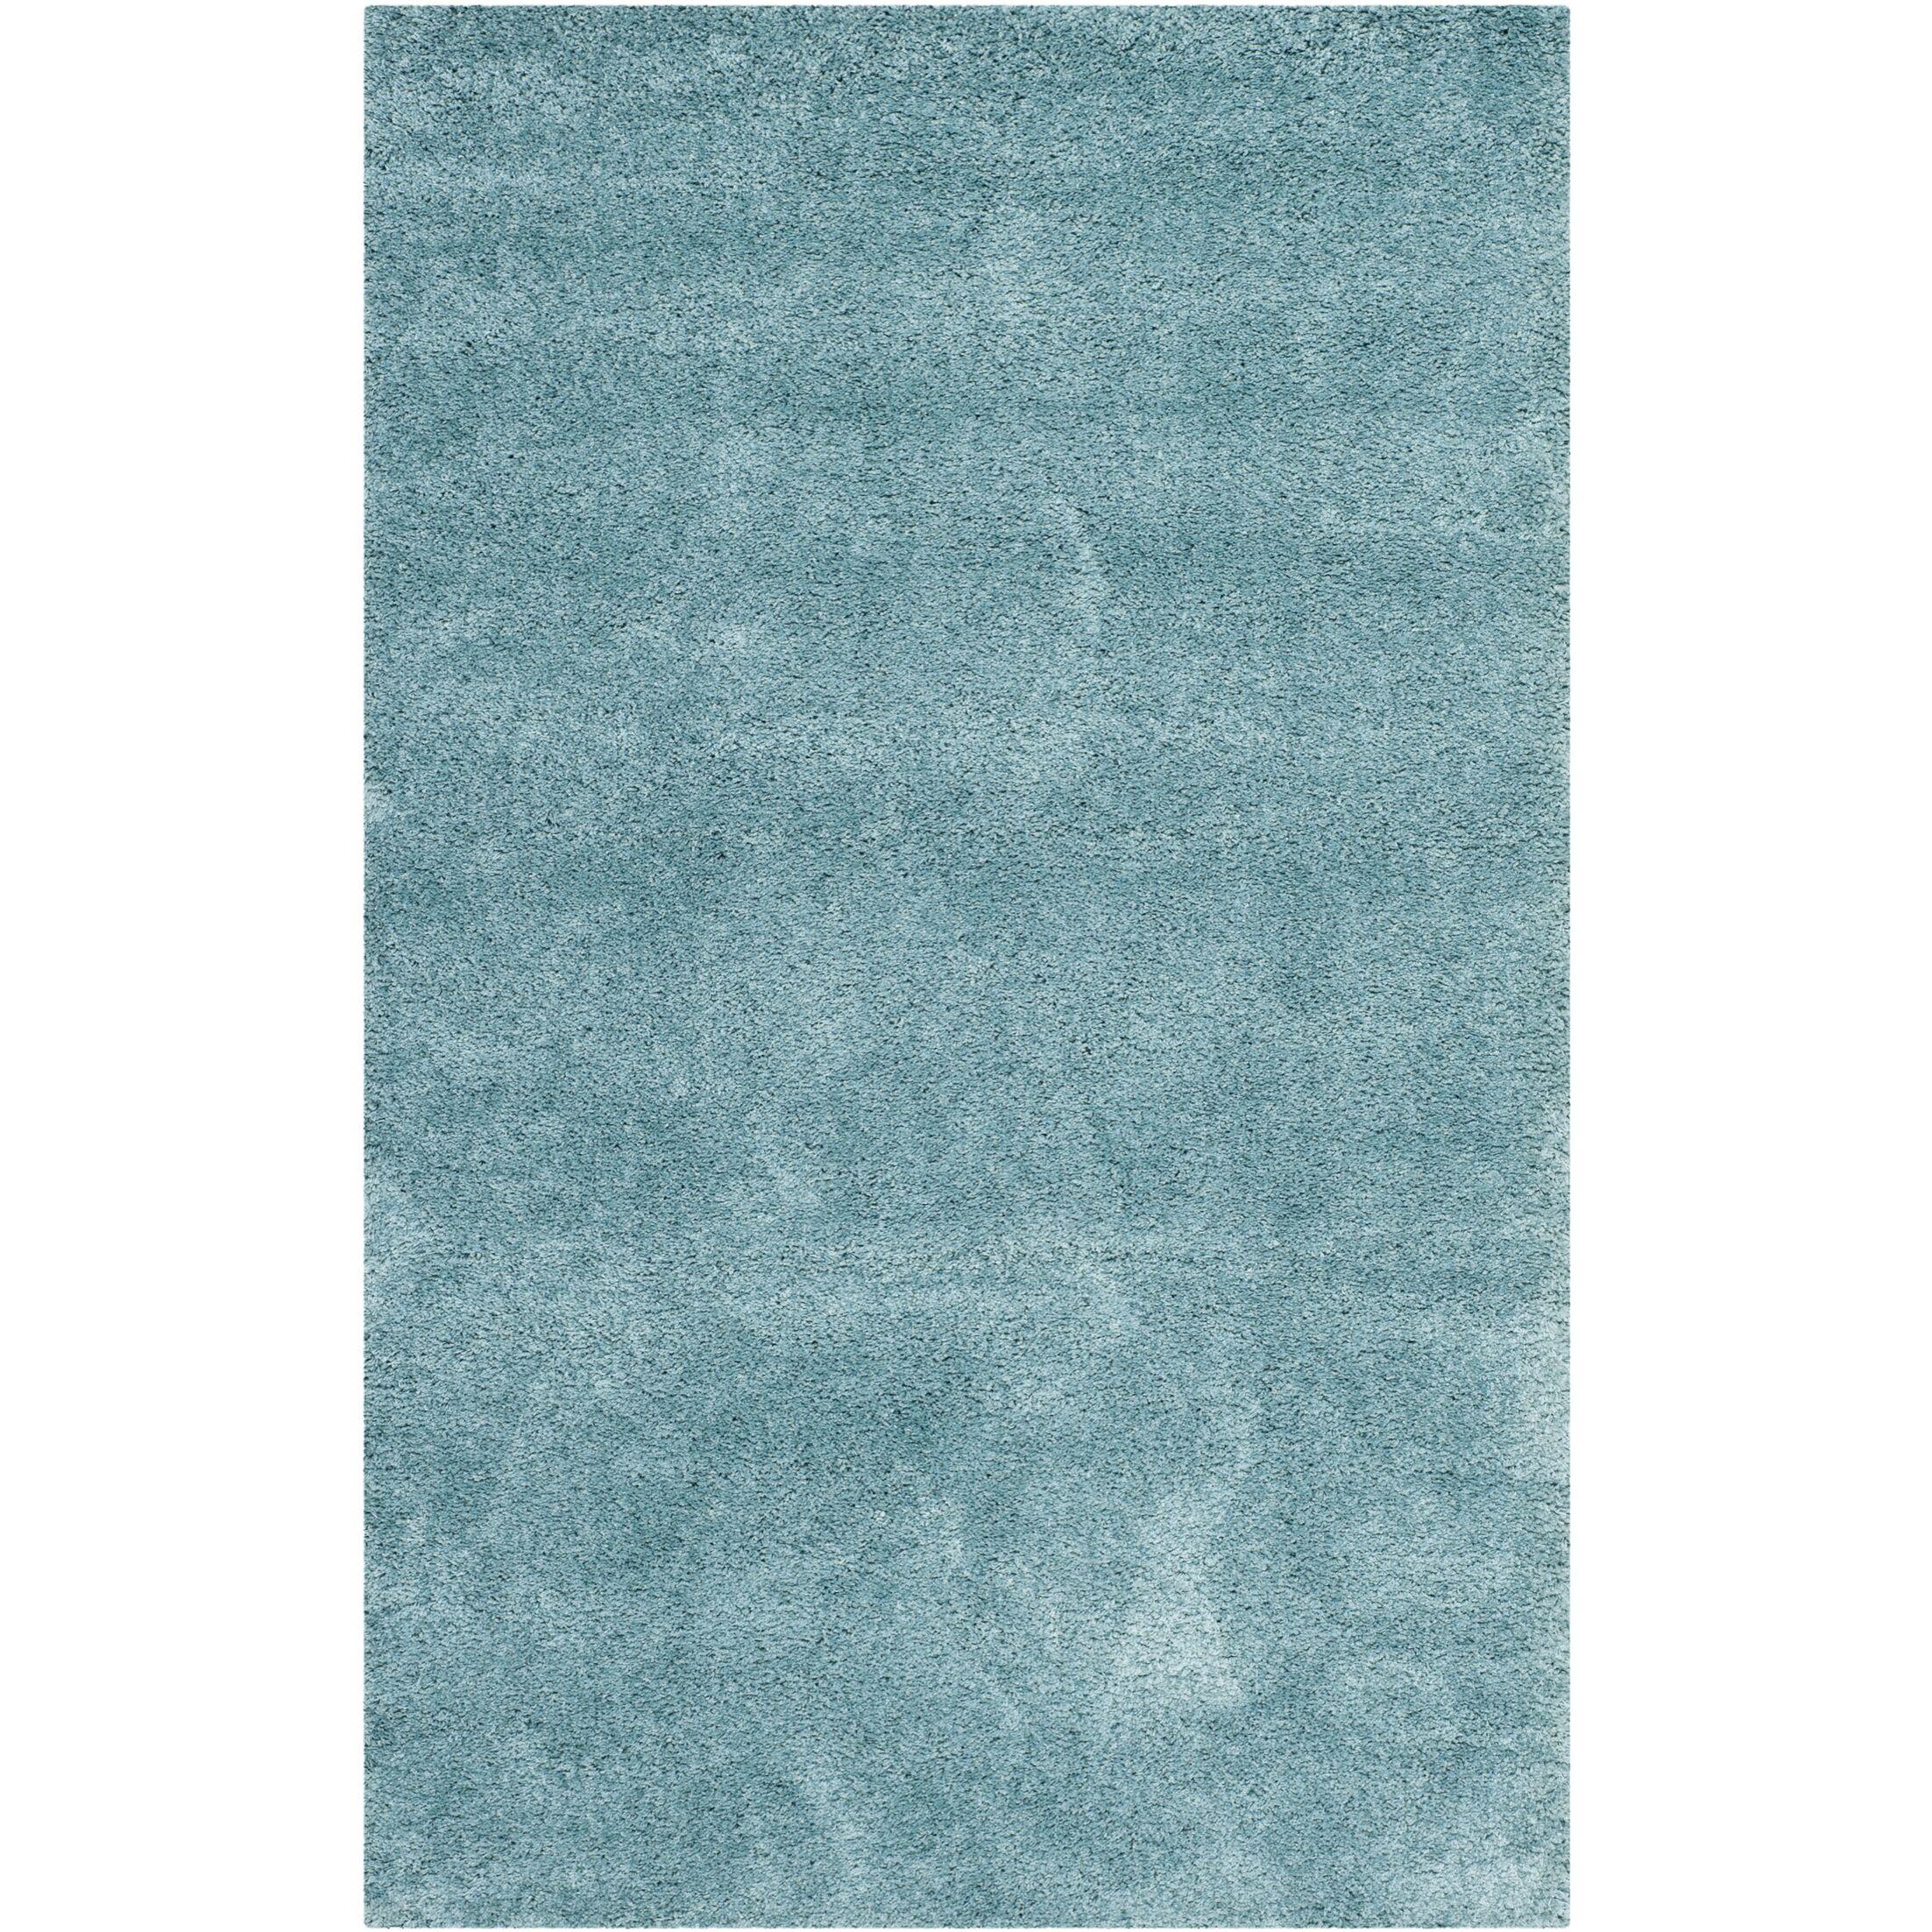 Starr Hill Aqua Blue Area Rug Rug Size: Rectangle 8' x 10'